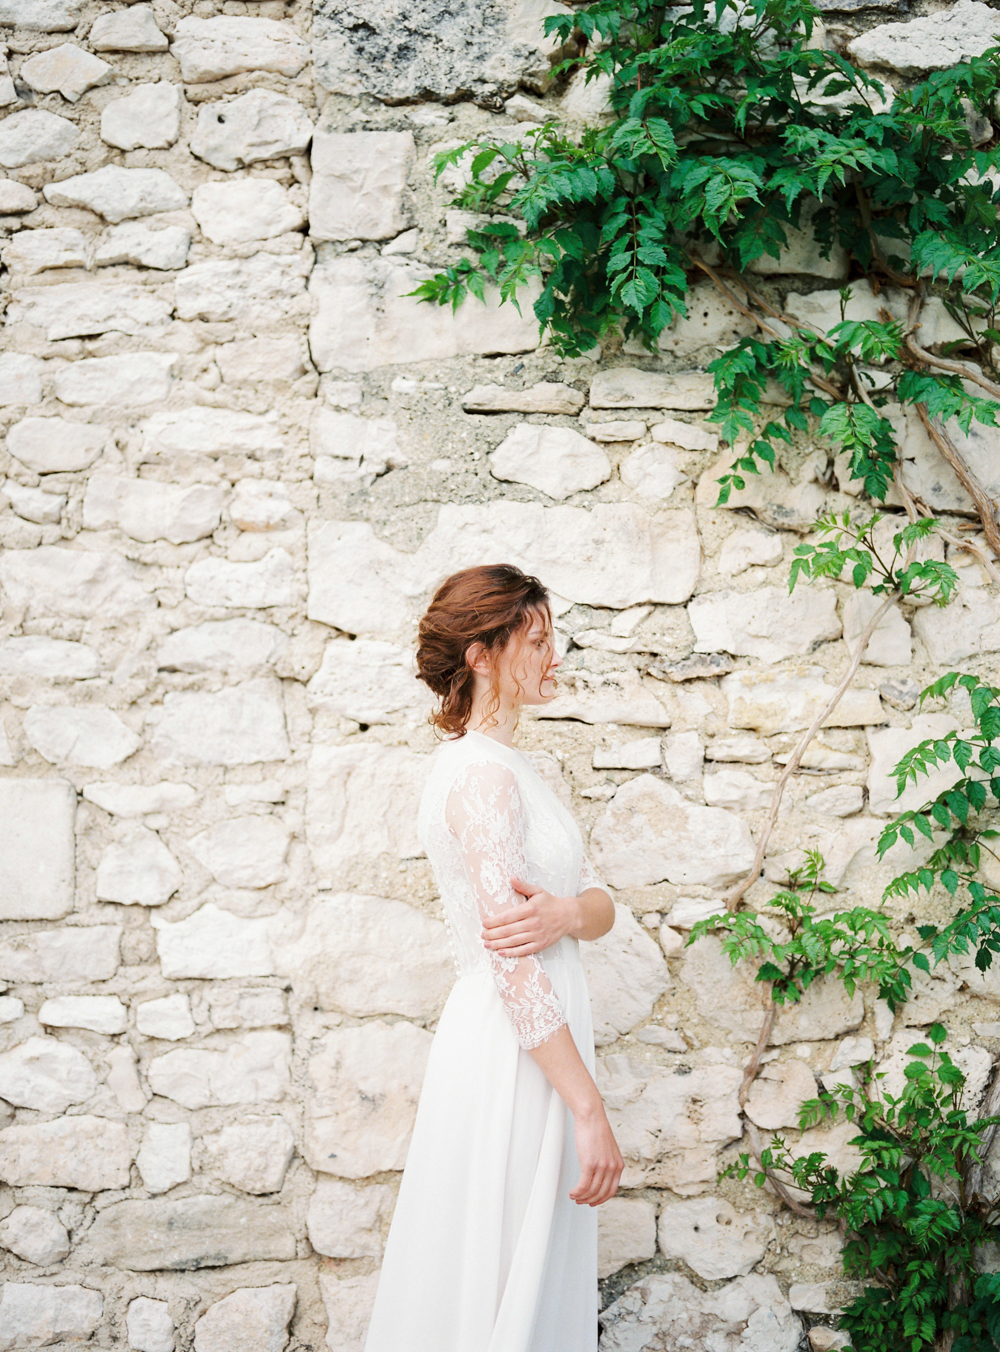 celine_chhuon_photography_Provence_Bride101.jpg